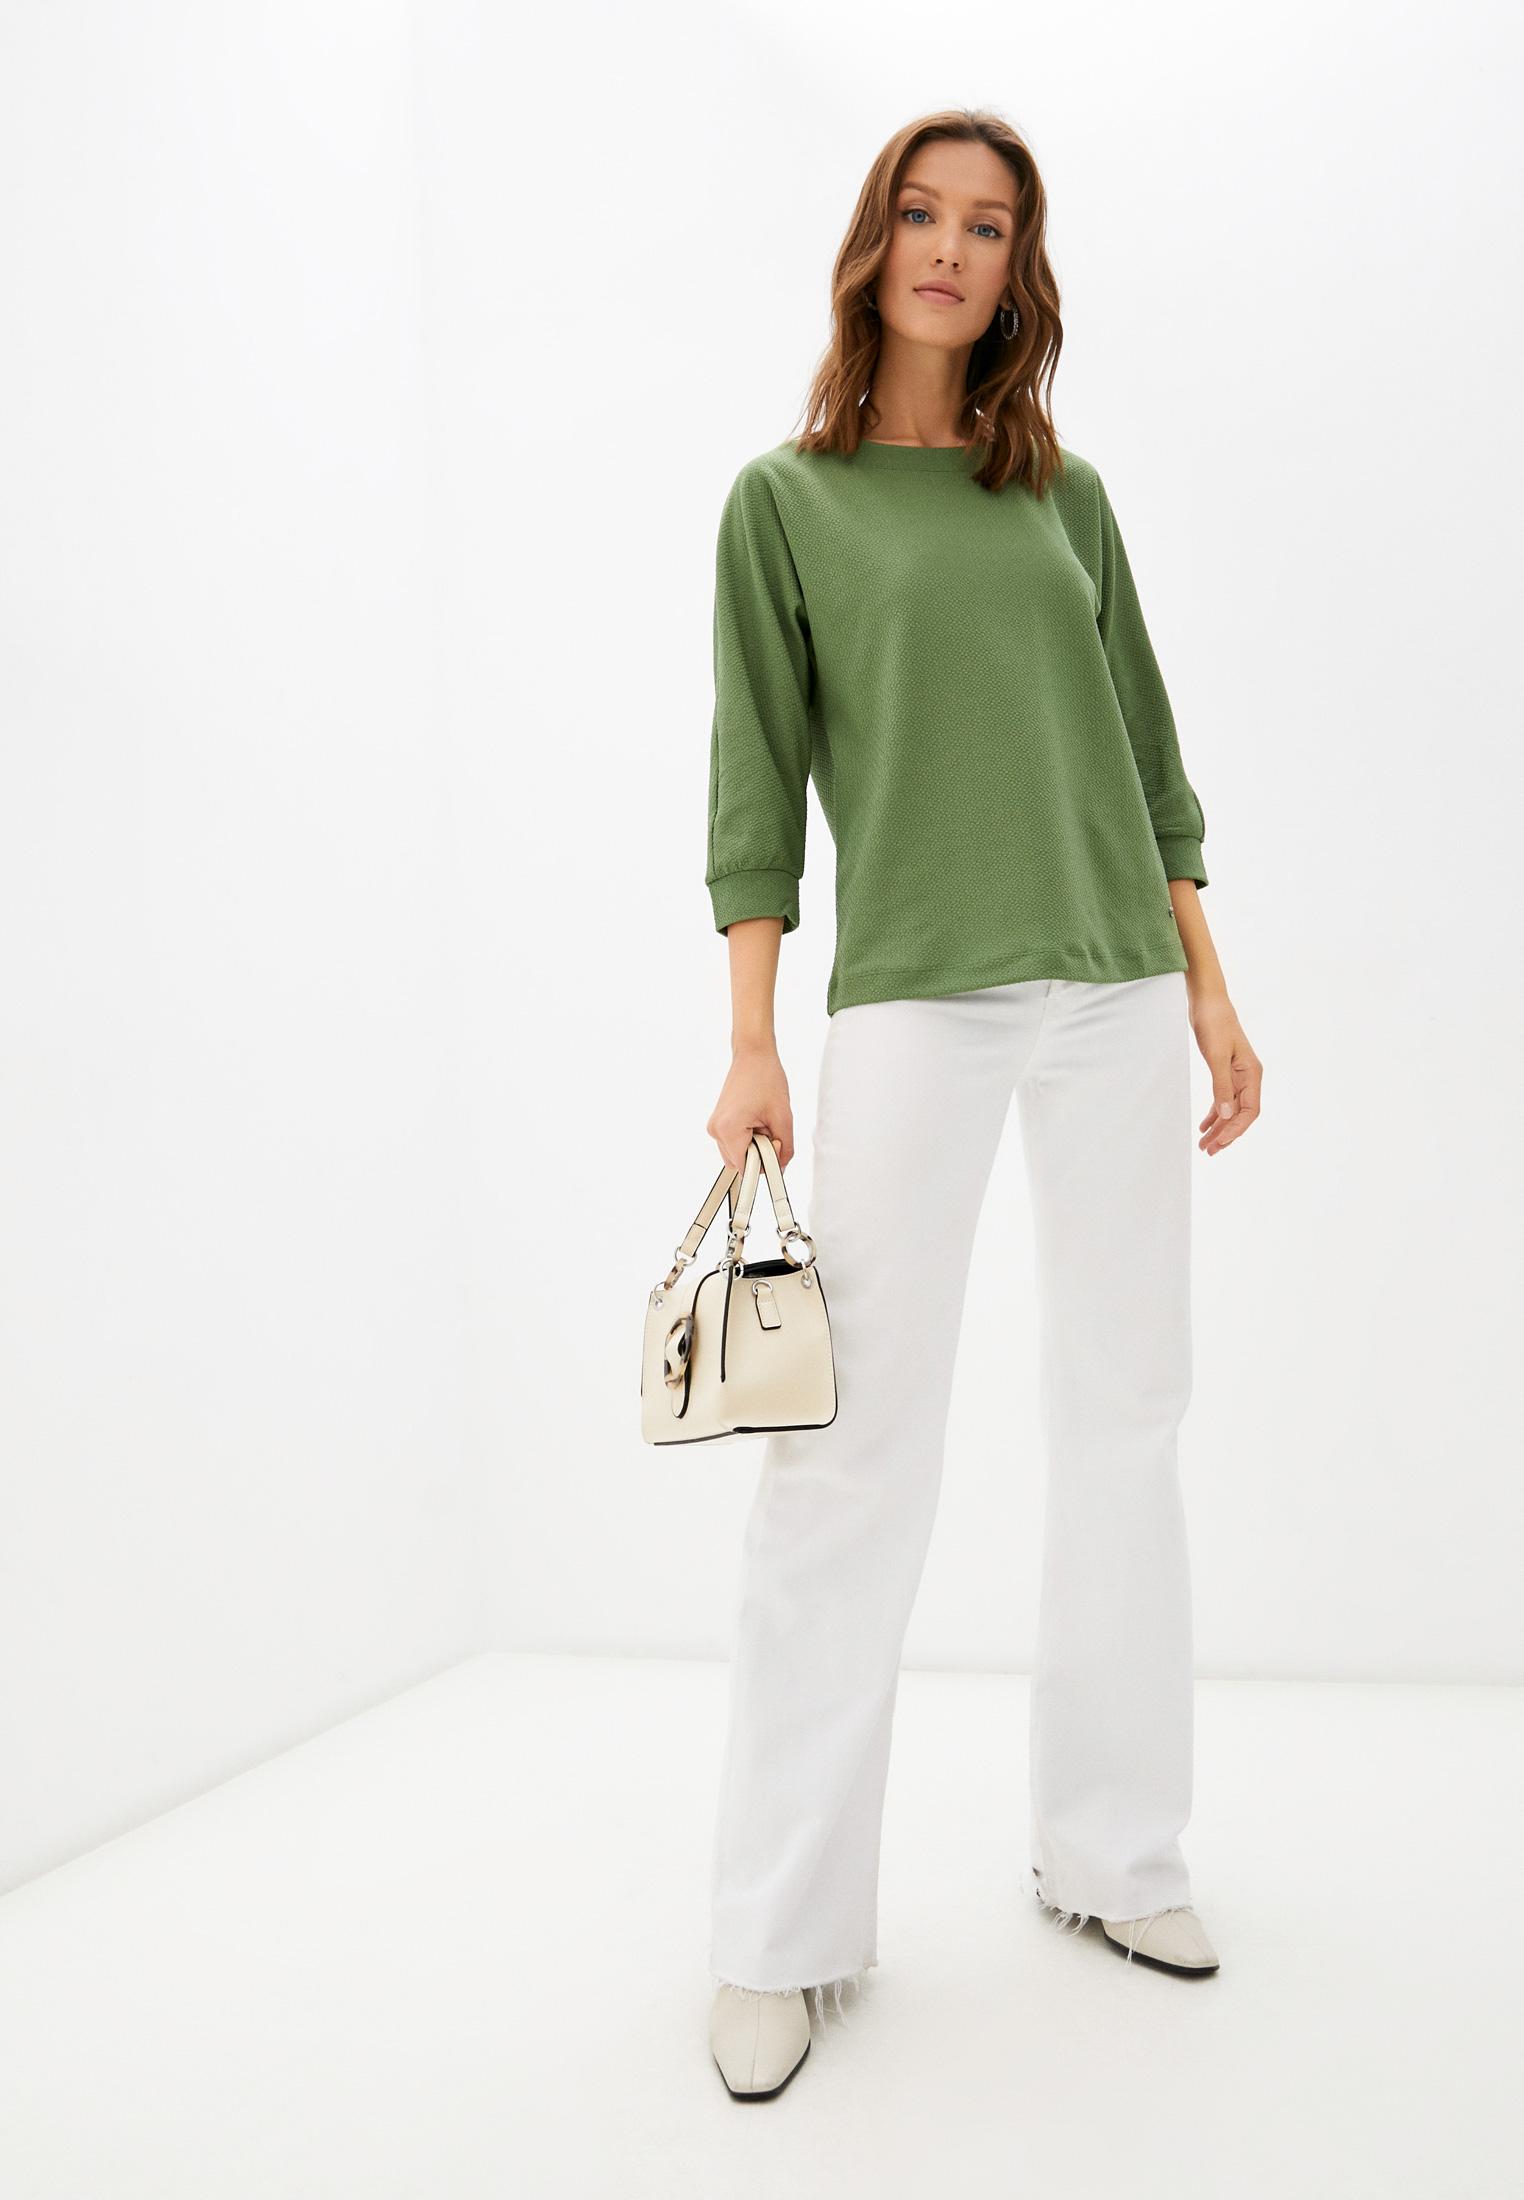 Блуза Betty & Co 2465/3236: изображение 2